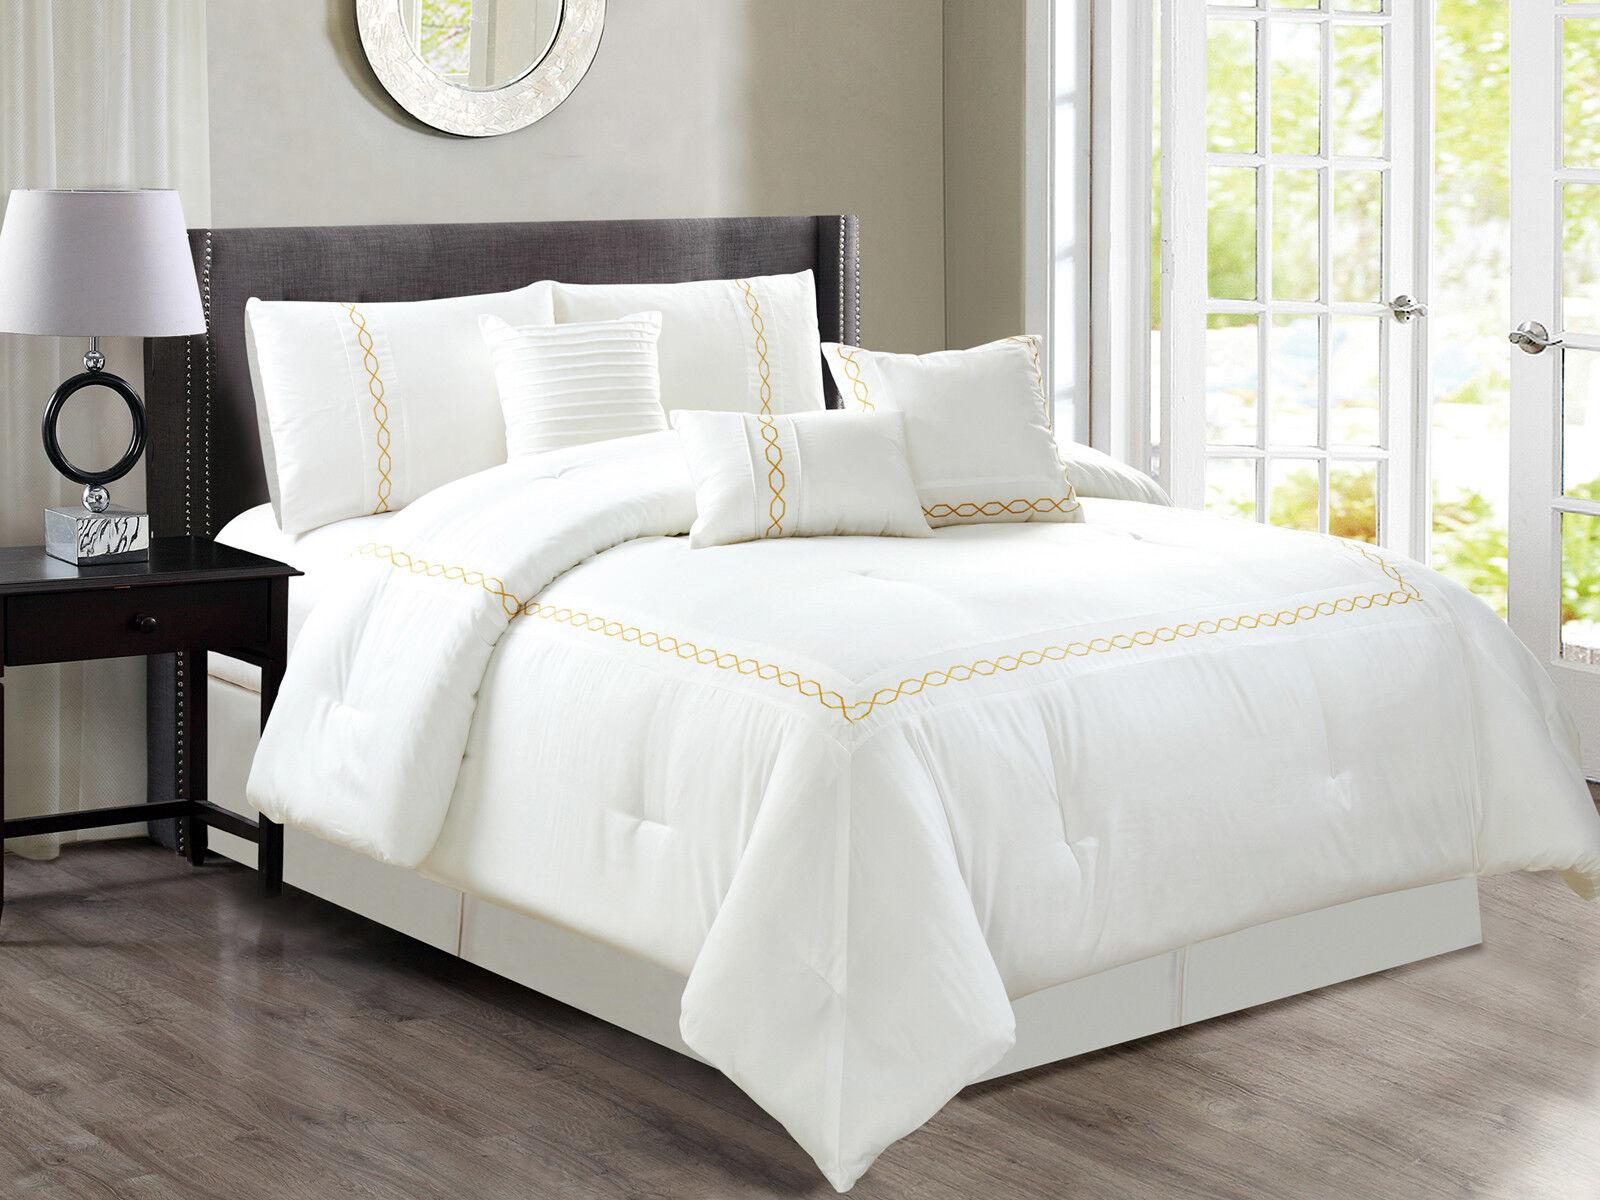 11-Pc Hoku Square Borderot Hexagonal Comforter Curtain Set Off-Weiß Gold Queen